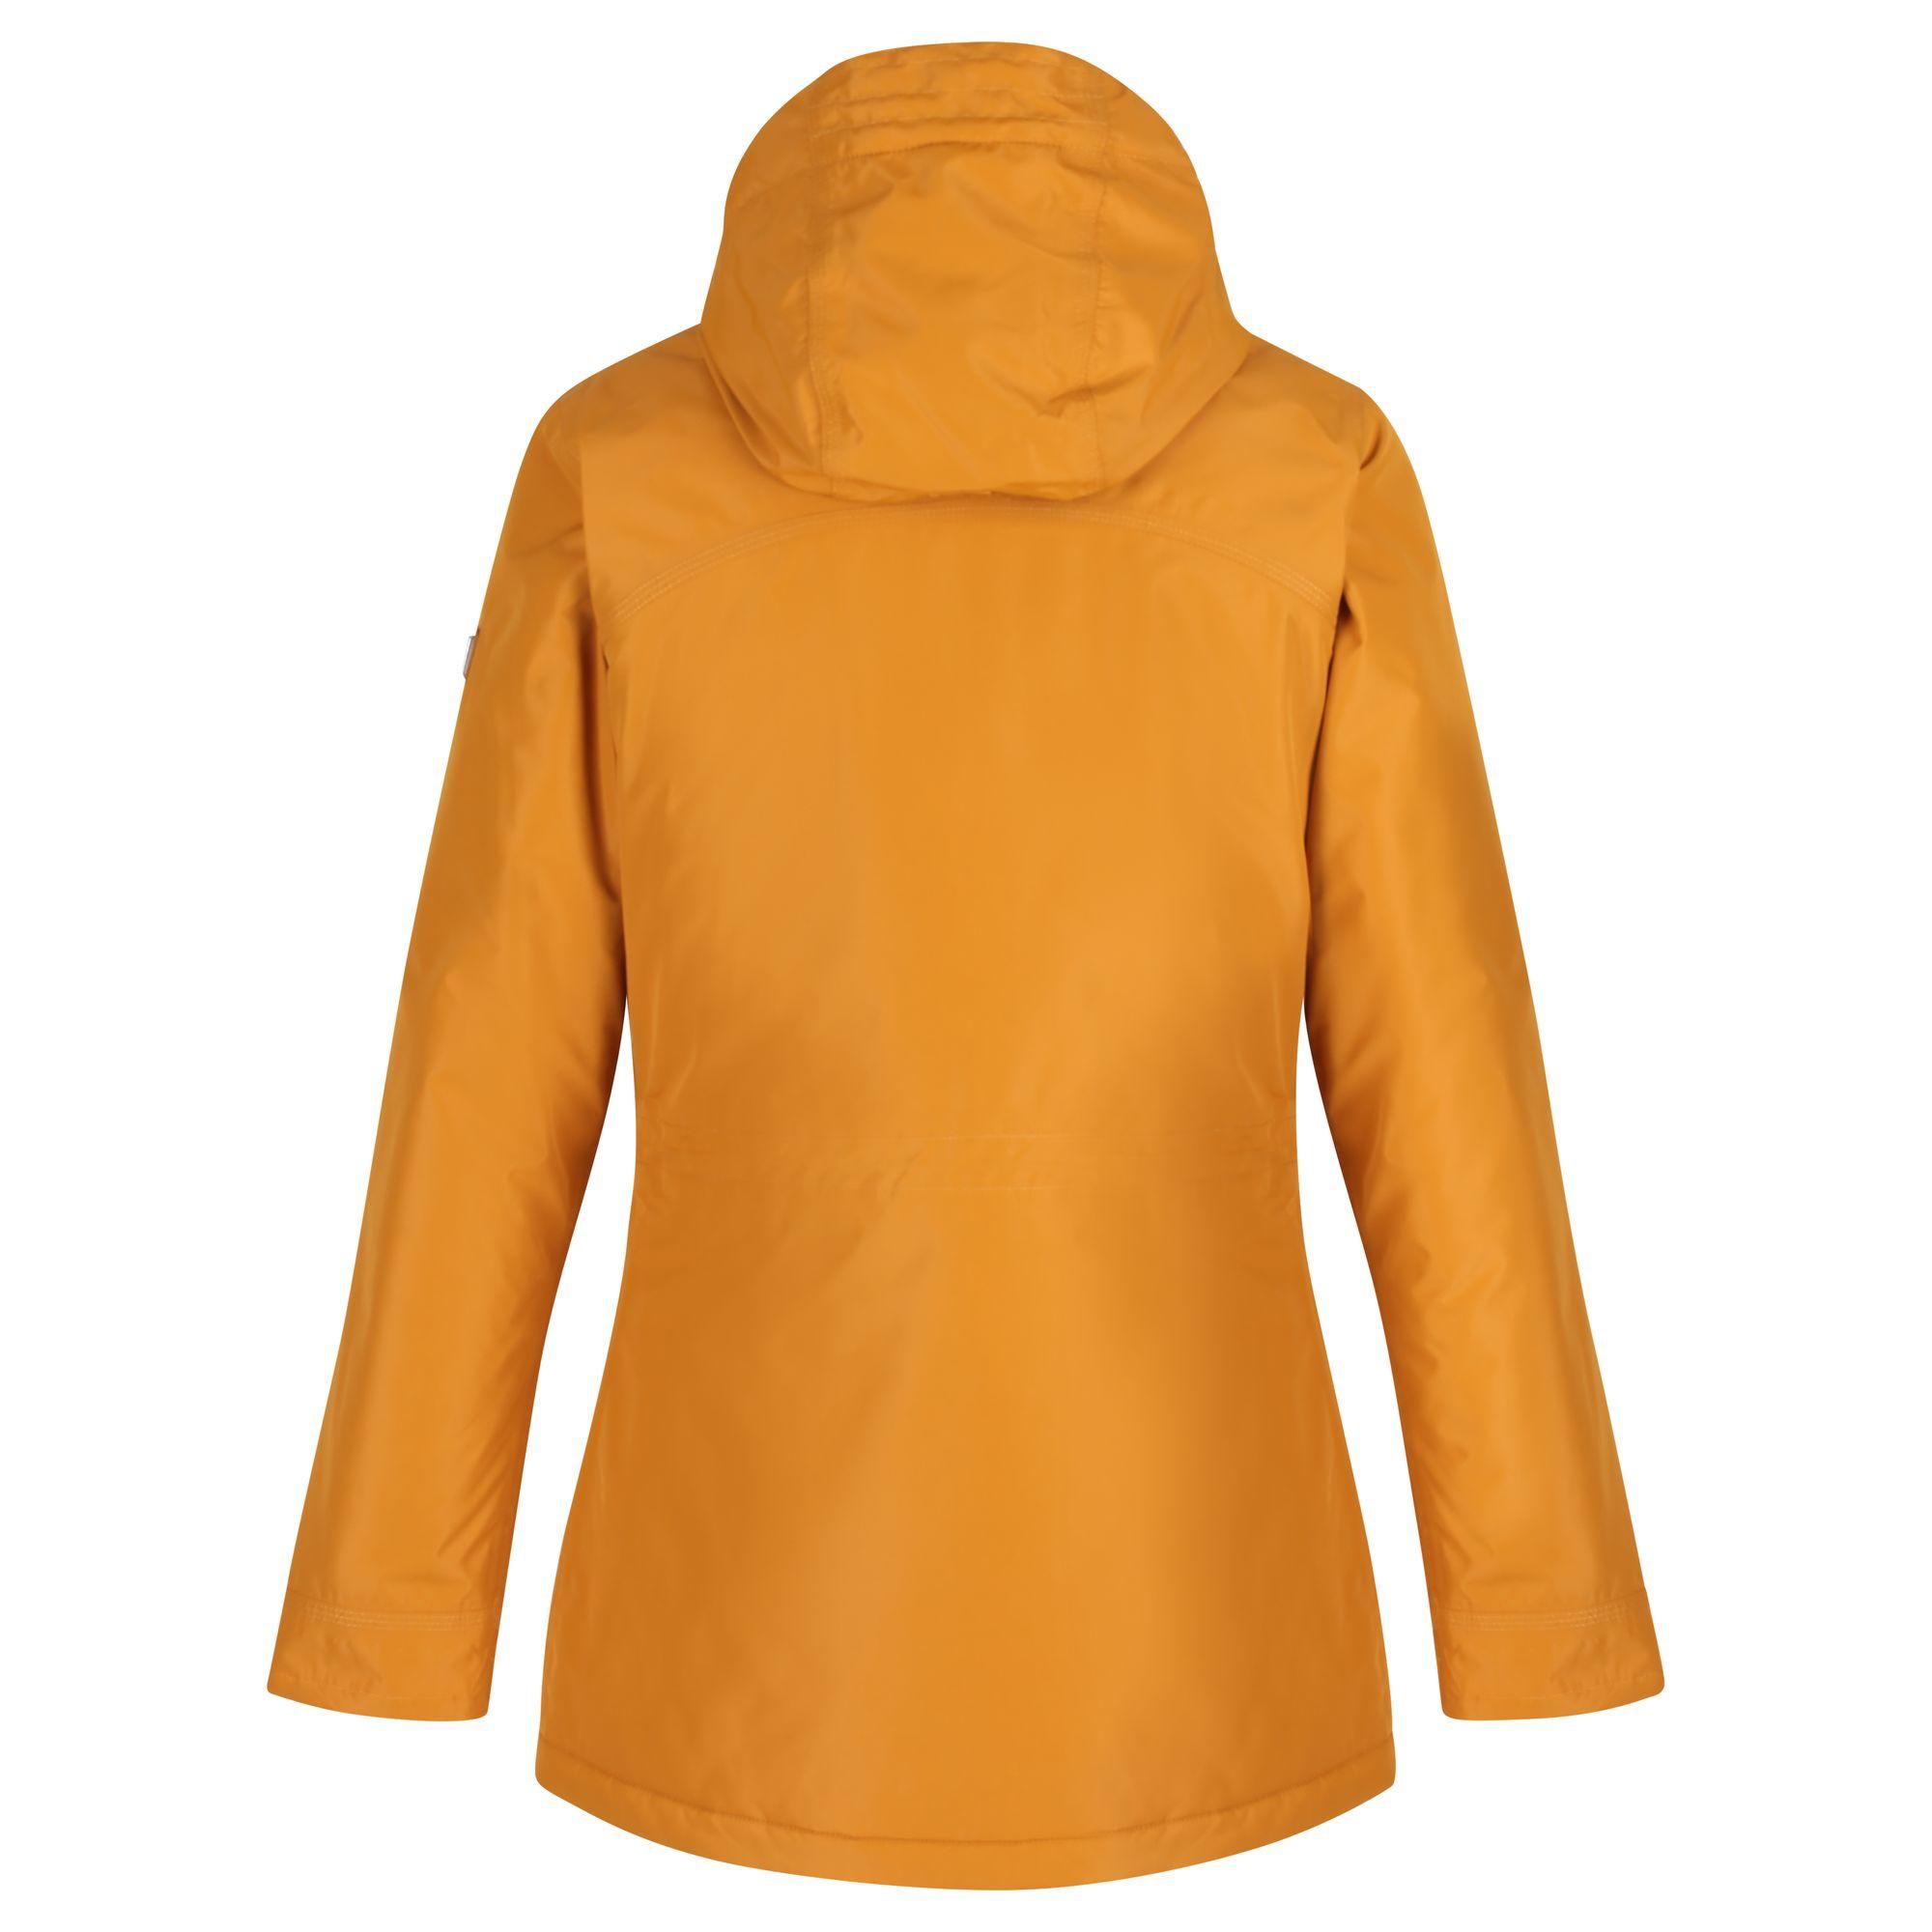 Regatta-Womens-Ladies-Braelynn-Long-Length-Waterproof-Jacket-RG4552 thumbnail 14